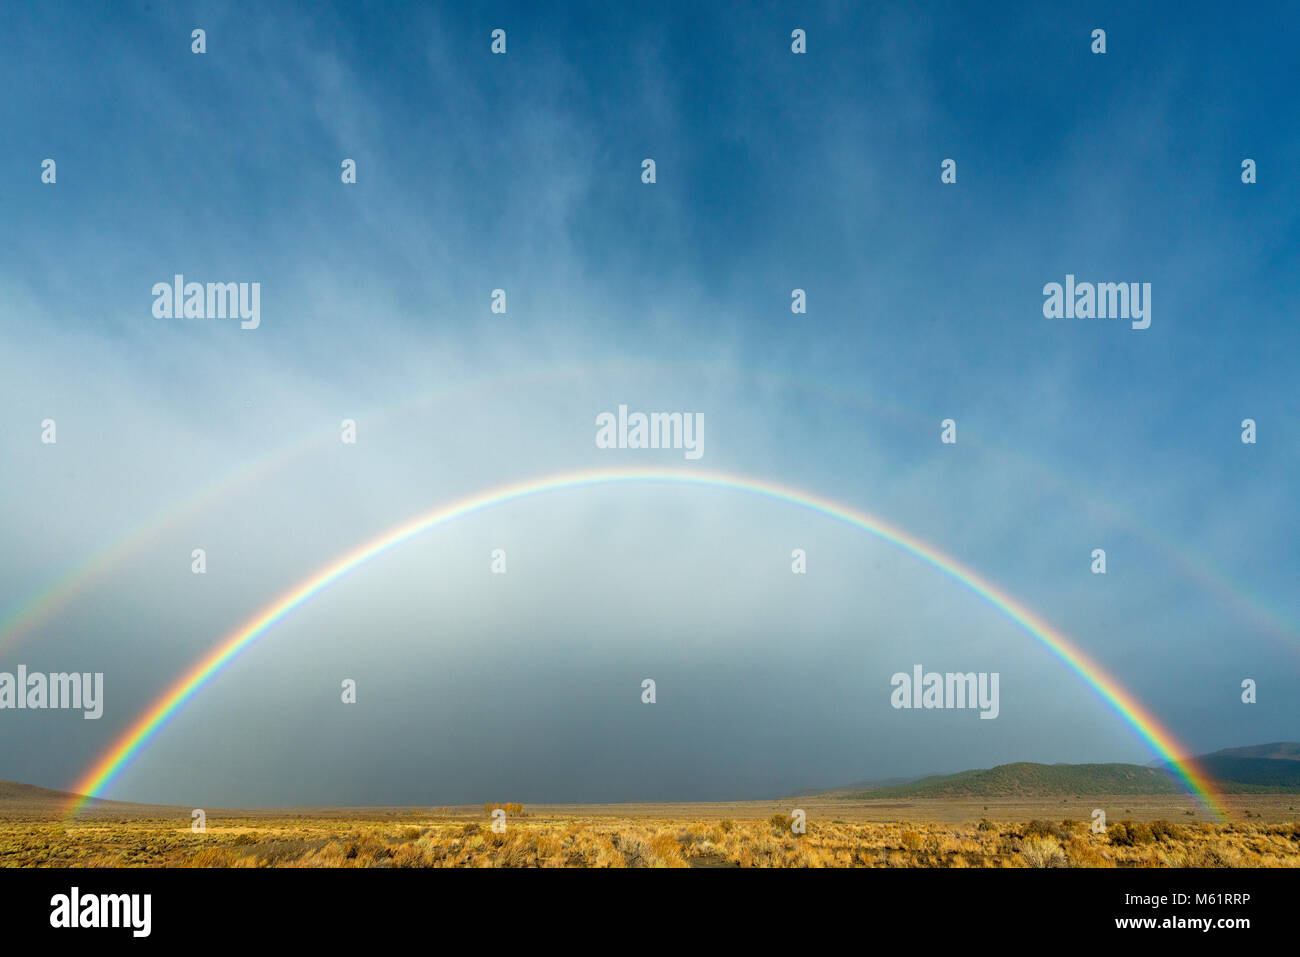 Double Rainbow, östlichen Sierra, Mono Basin National Forest Scenic Area, Inyo National Forest, Kalifornien Stockbild